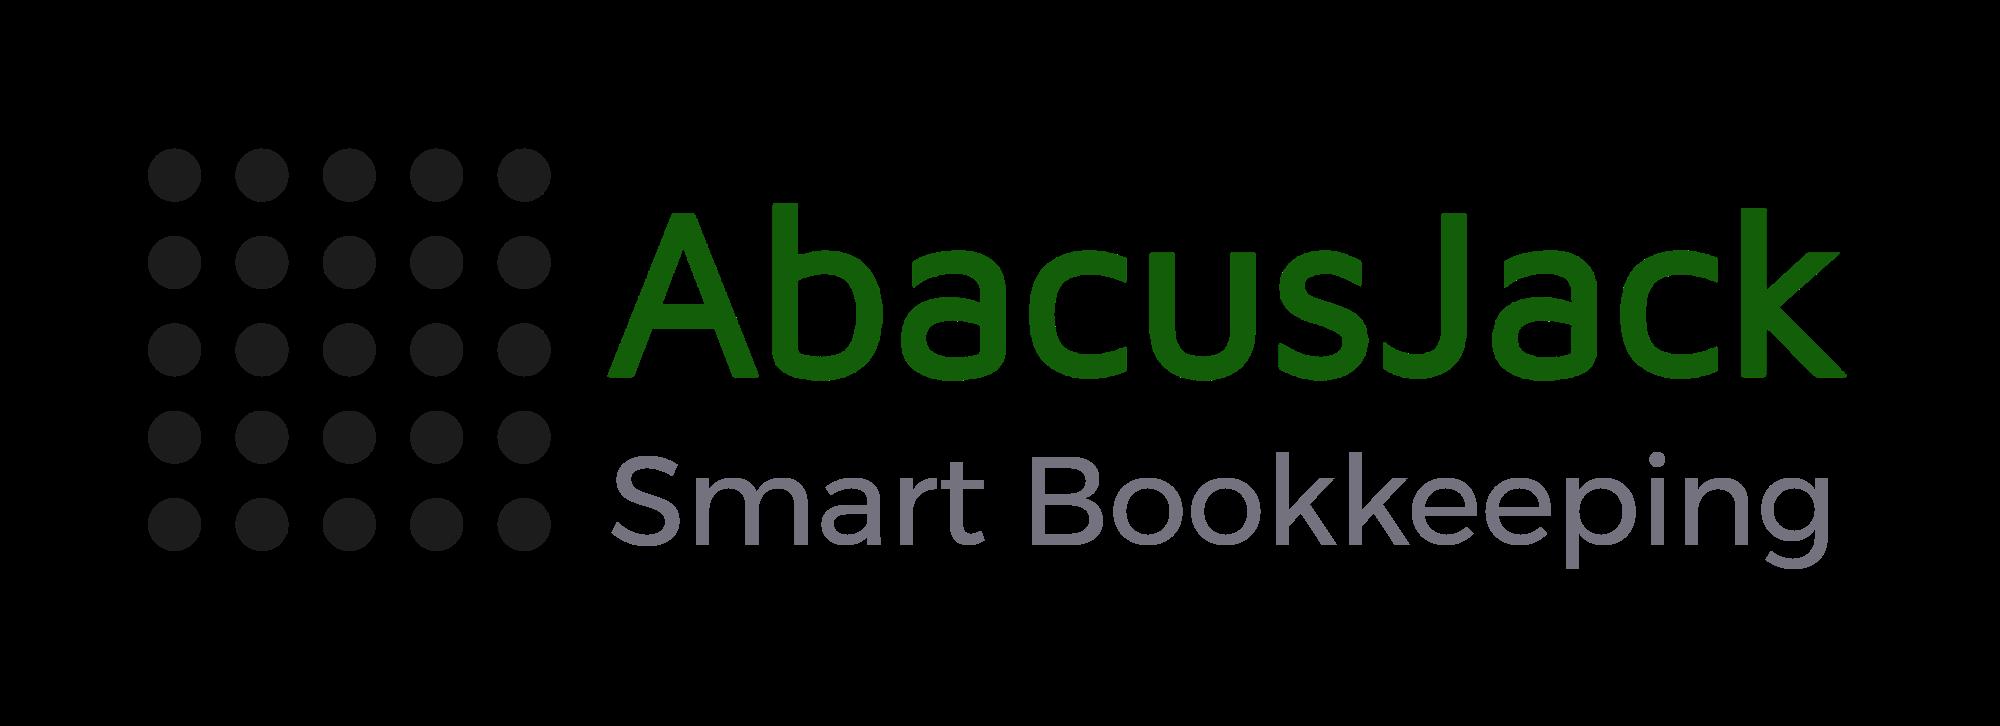 abacus jack-logo.png